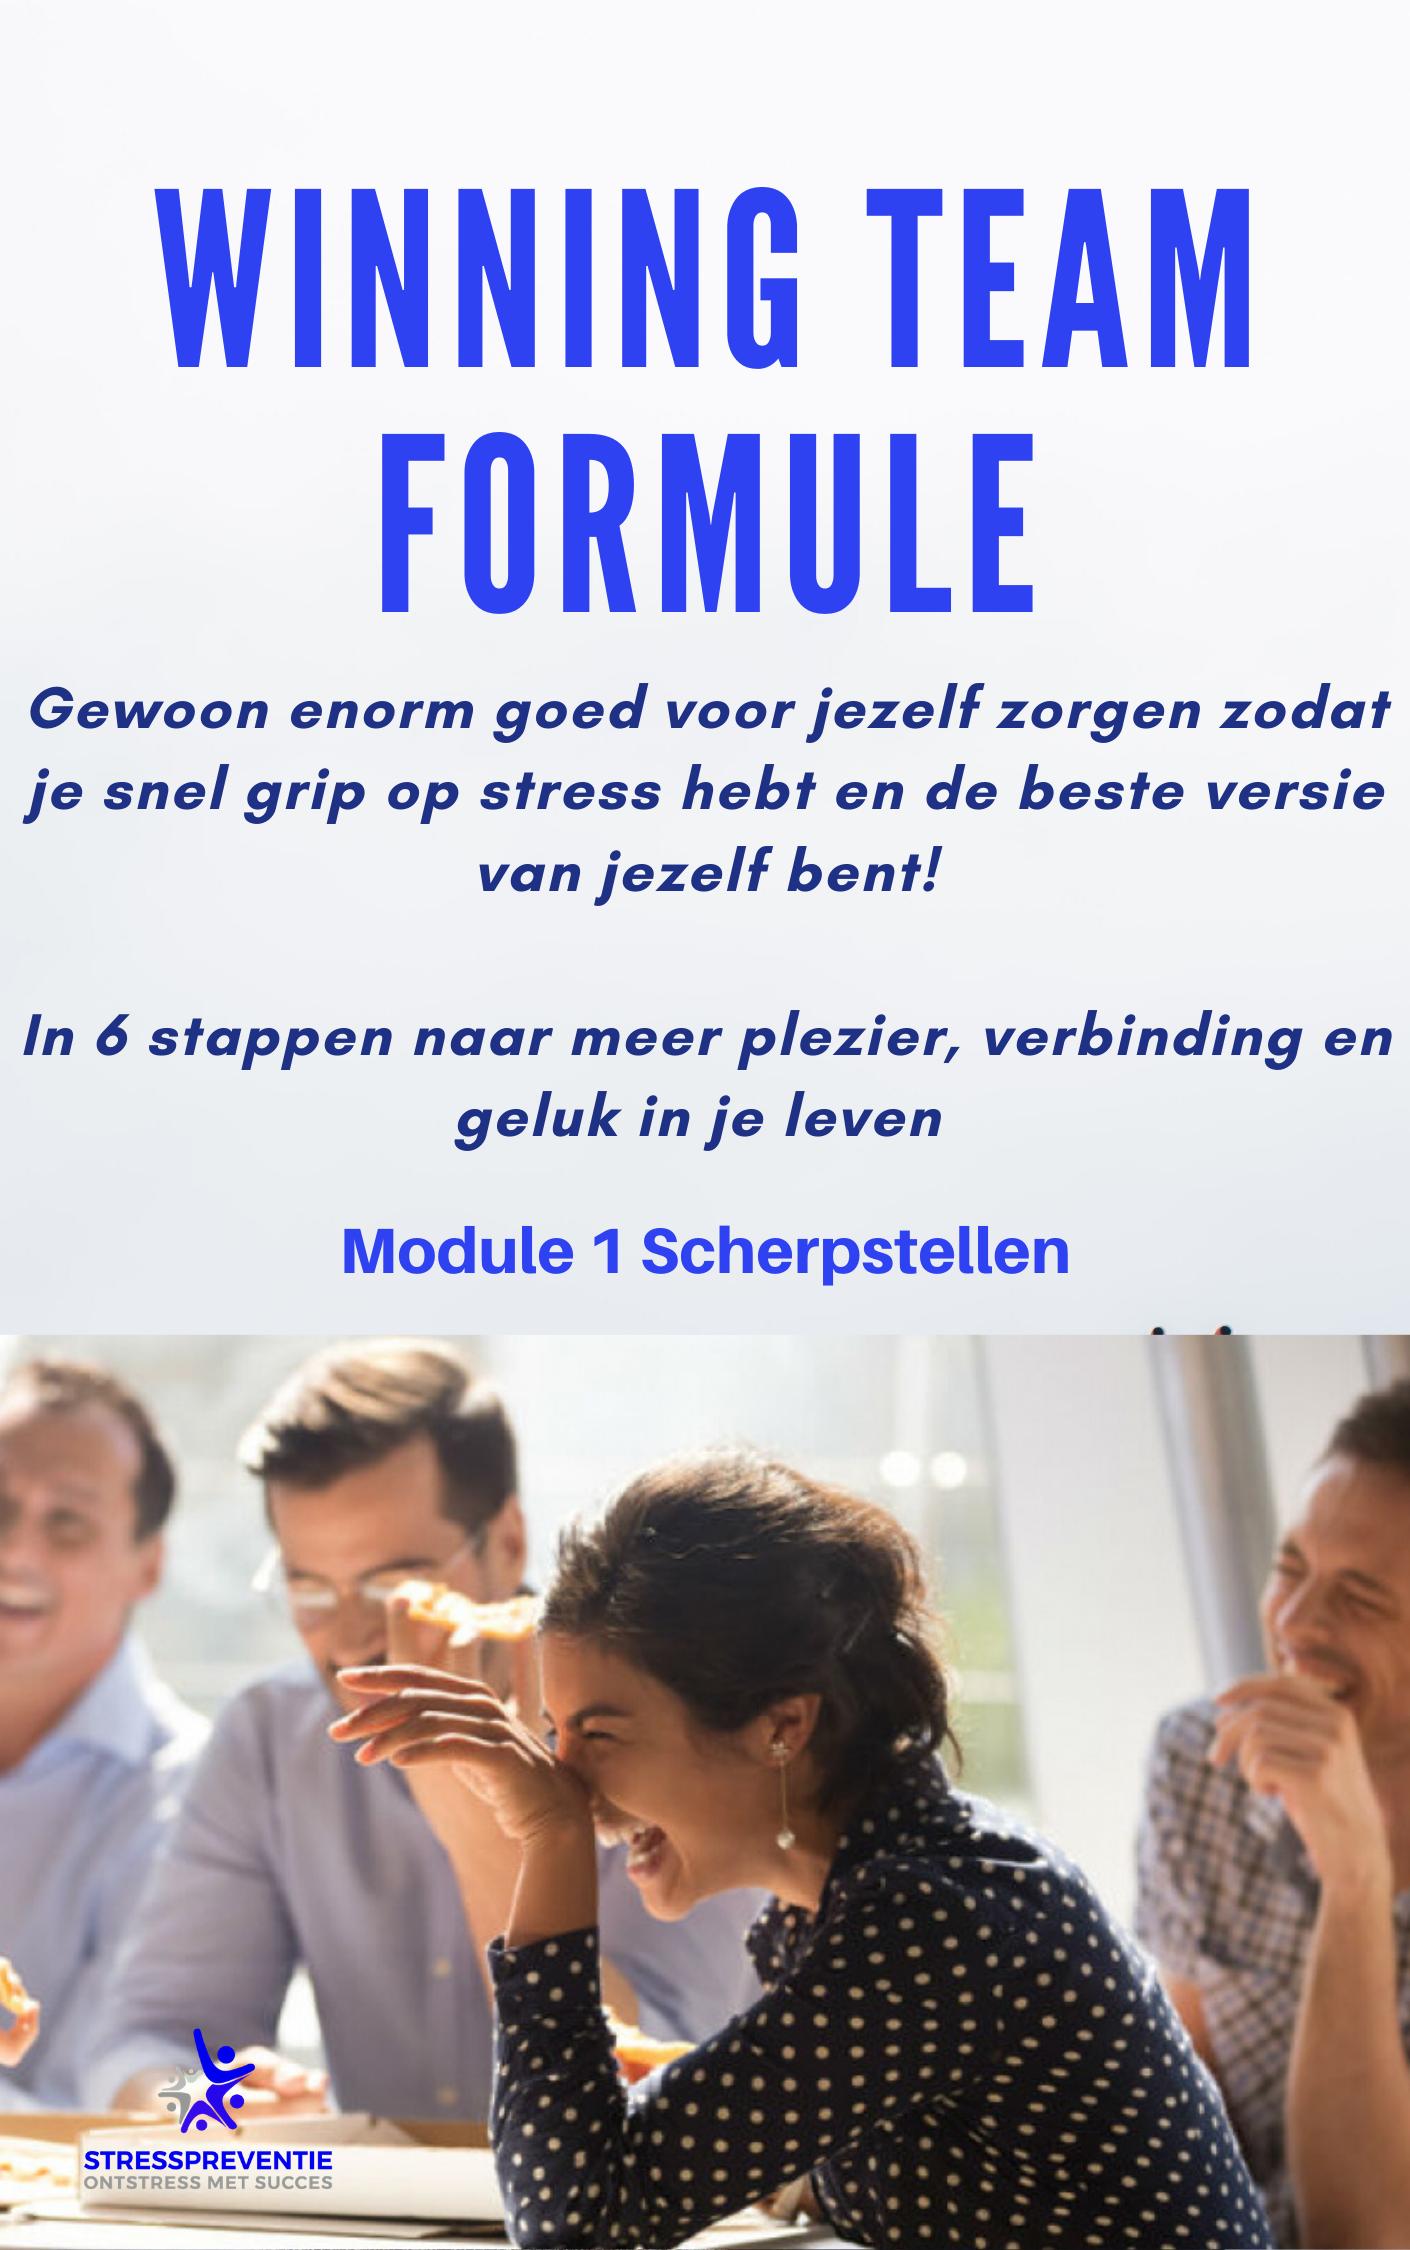 Winning team module 1